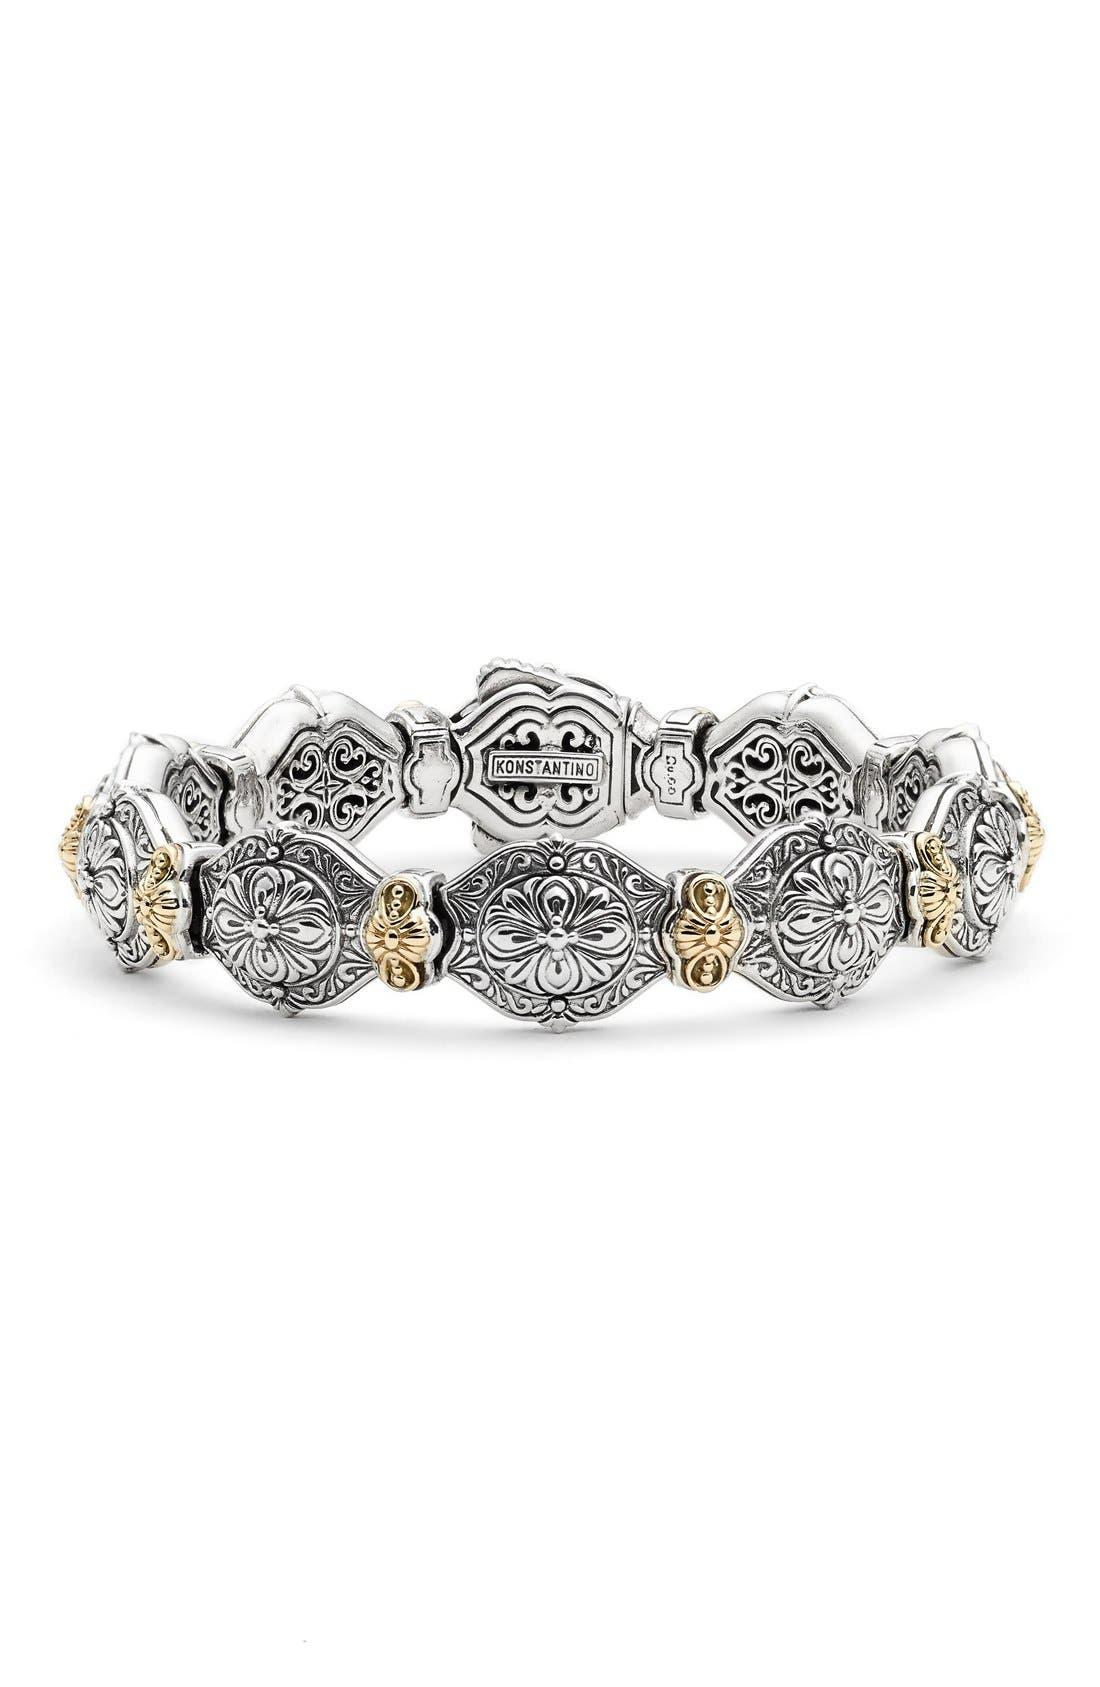 KONSTANTINO Silver & Gold Classics Link Bracelet